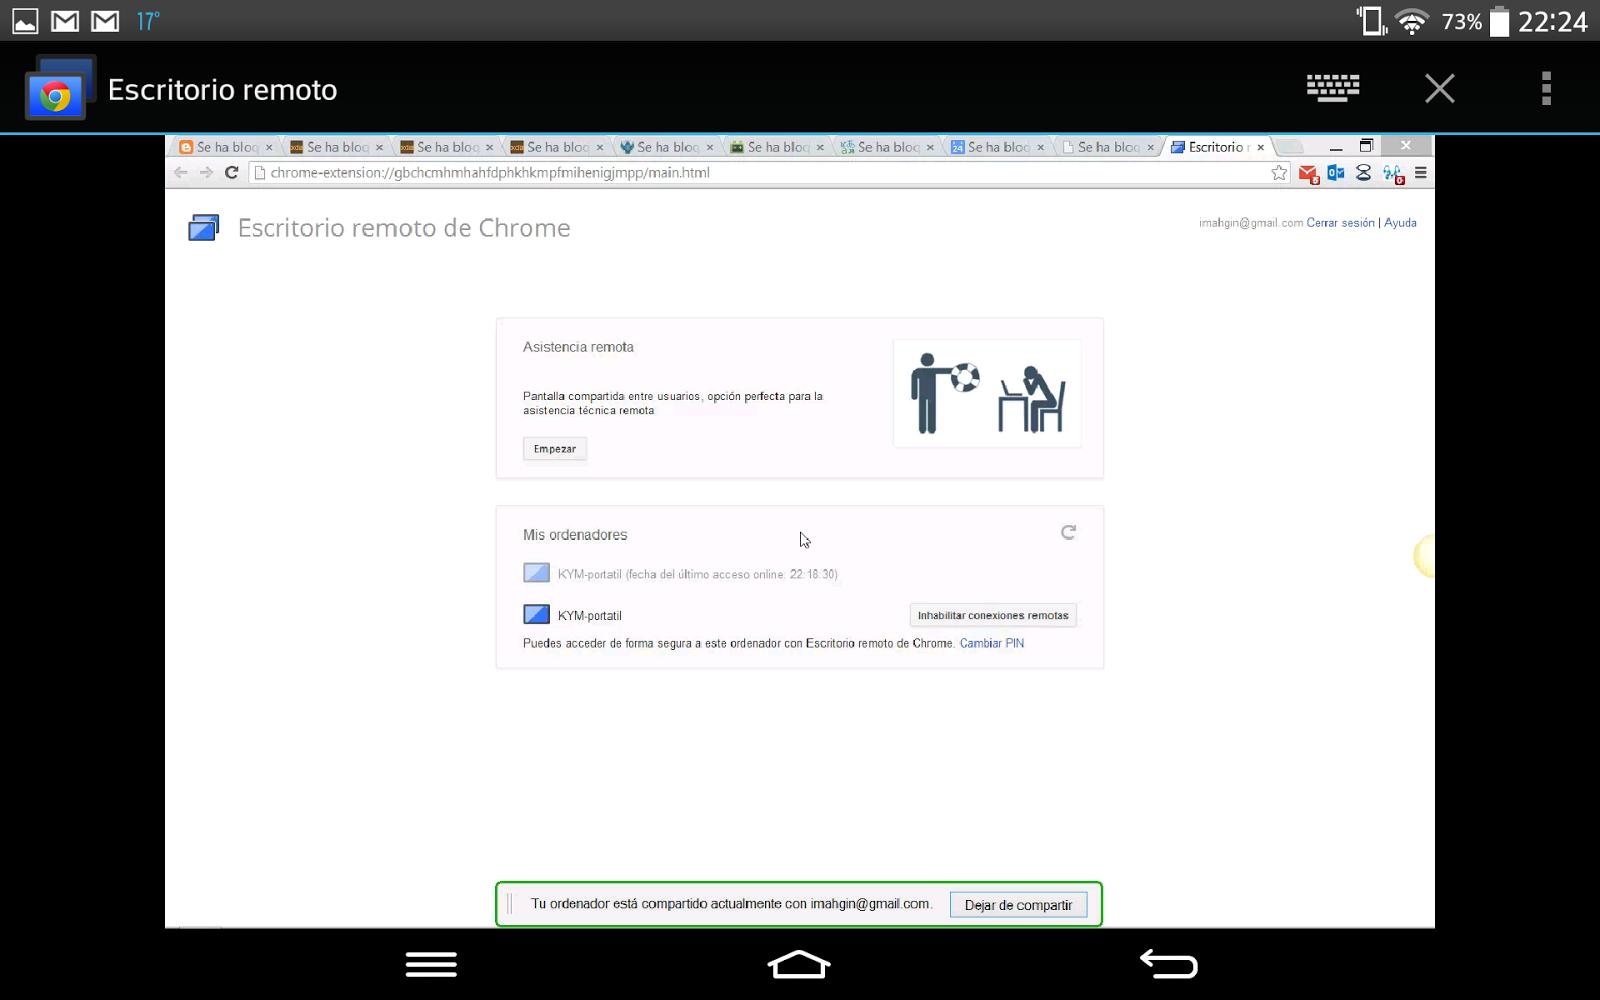 Imahginable escritorio remoto google controla tu ordenador desde chrome o desde android - Escritorio remoto ...